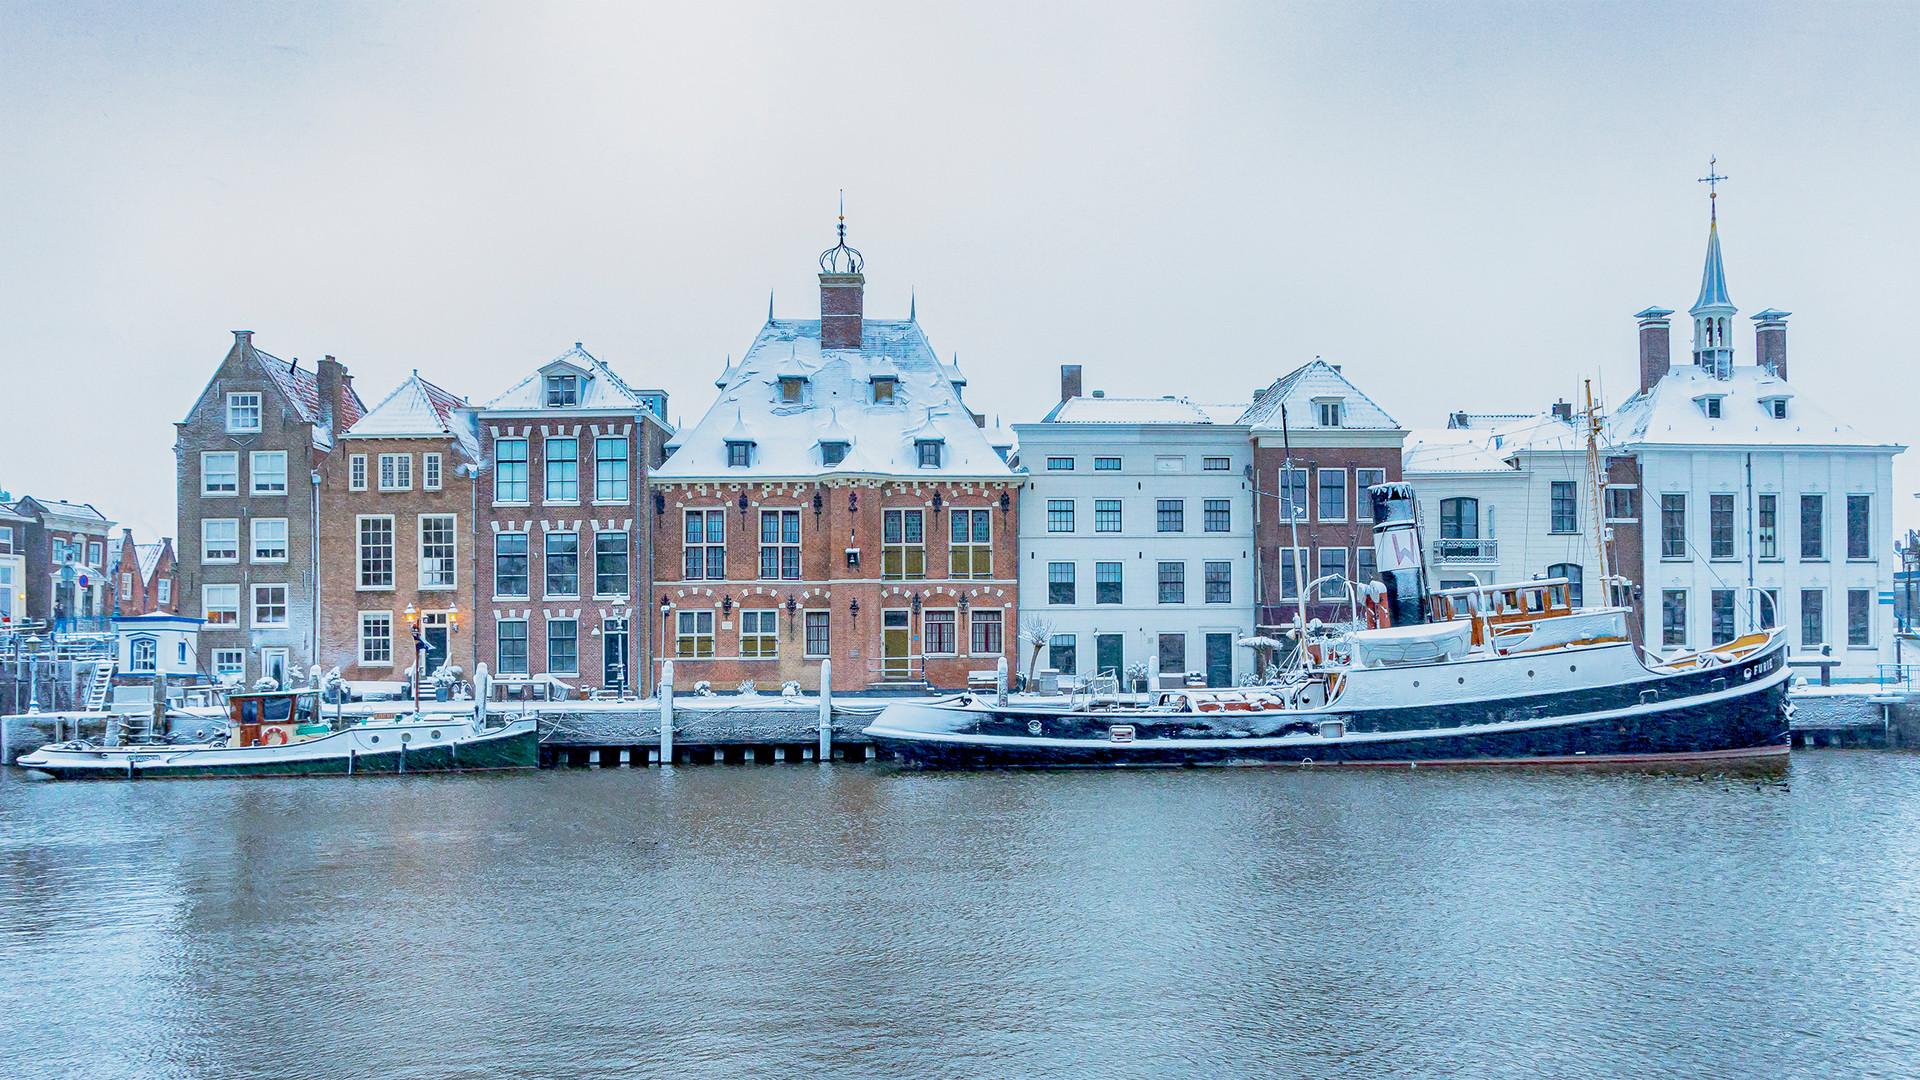 Sneeuw 2021 Stadhuiskade-208711.jpg